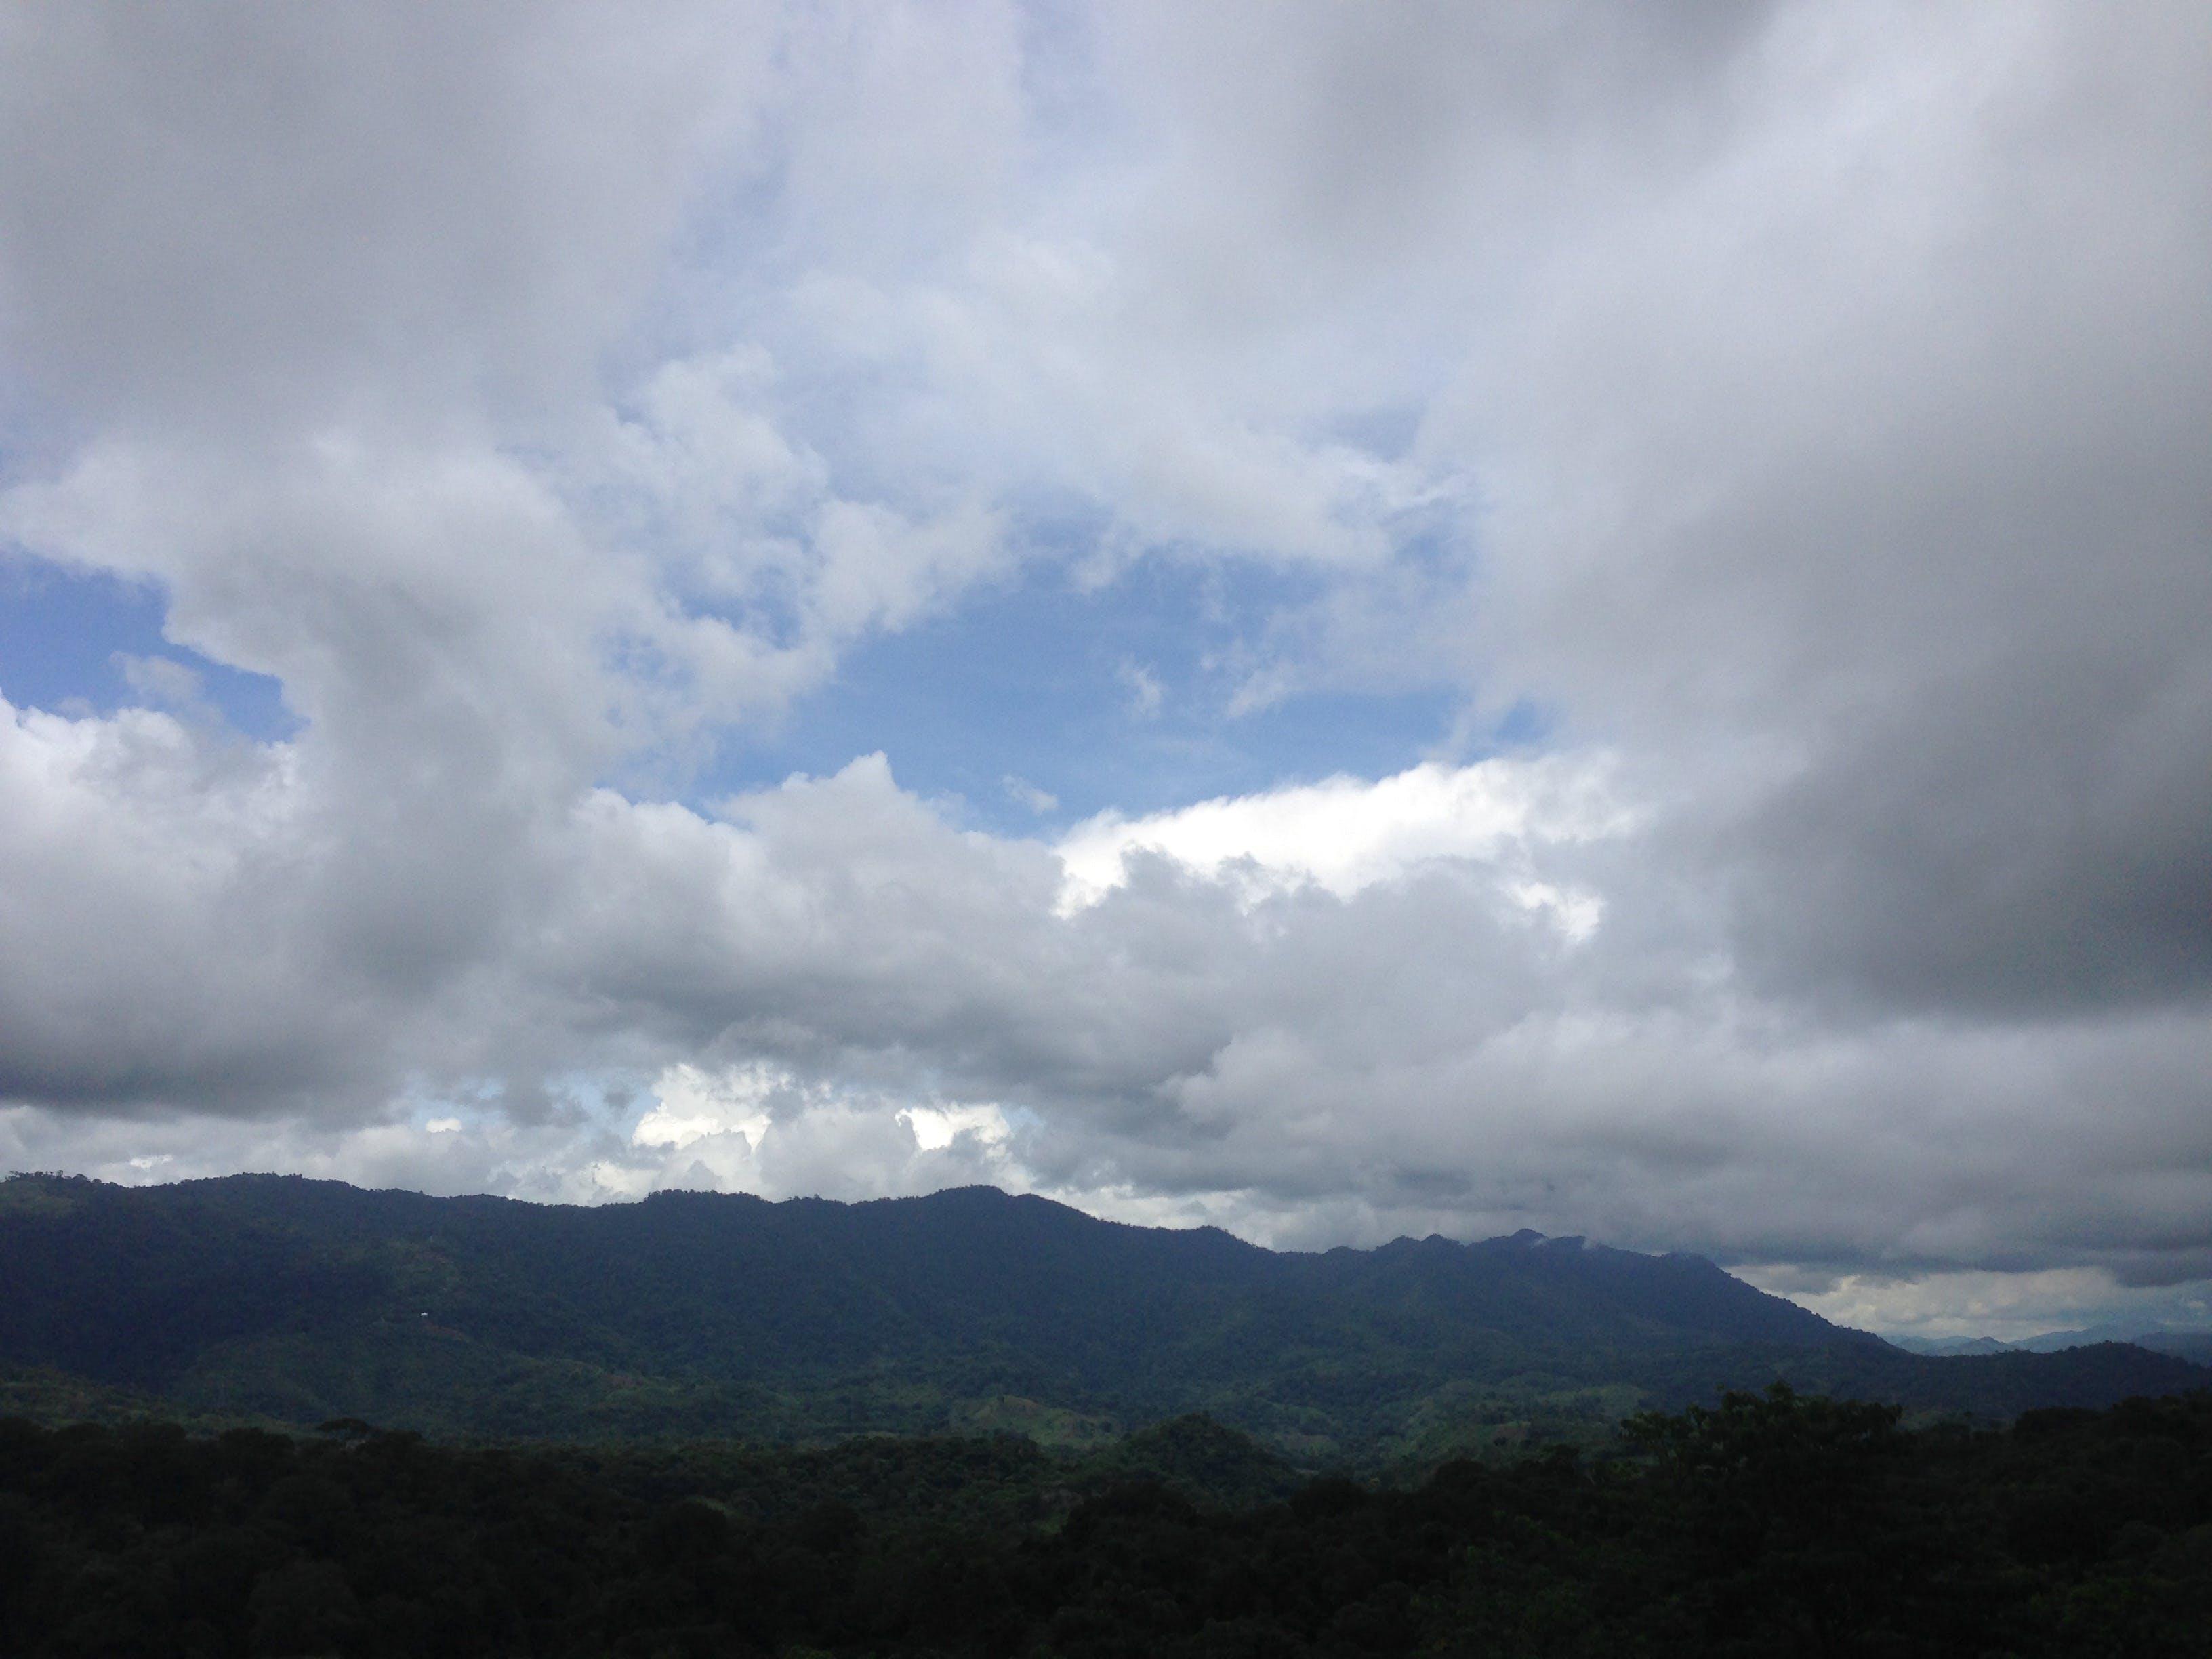 Free stock photo of Costa Rica, mountains, skyline